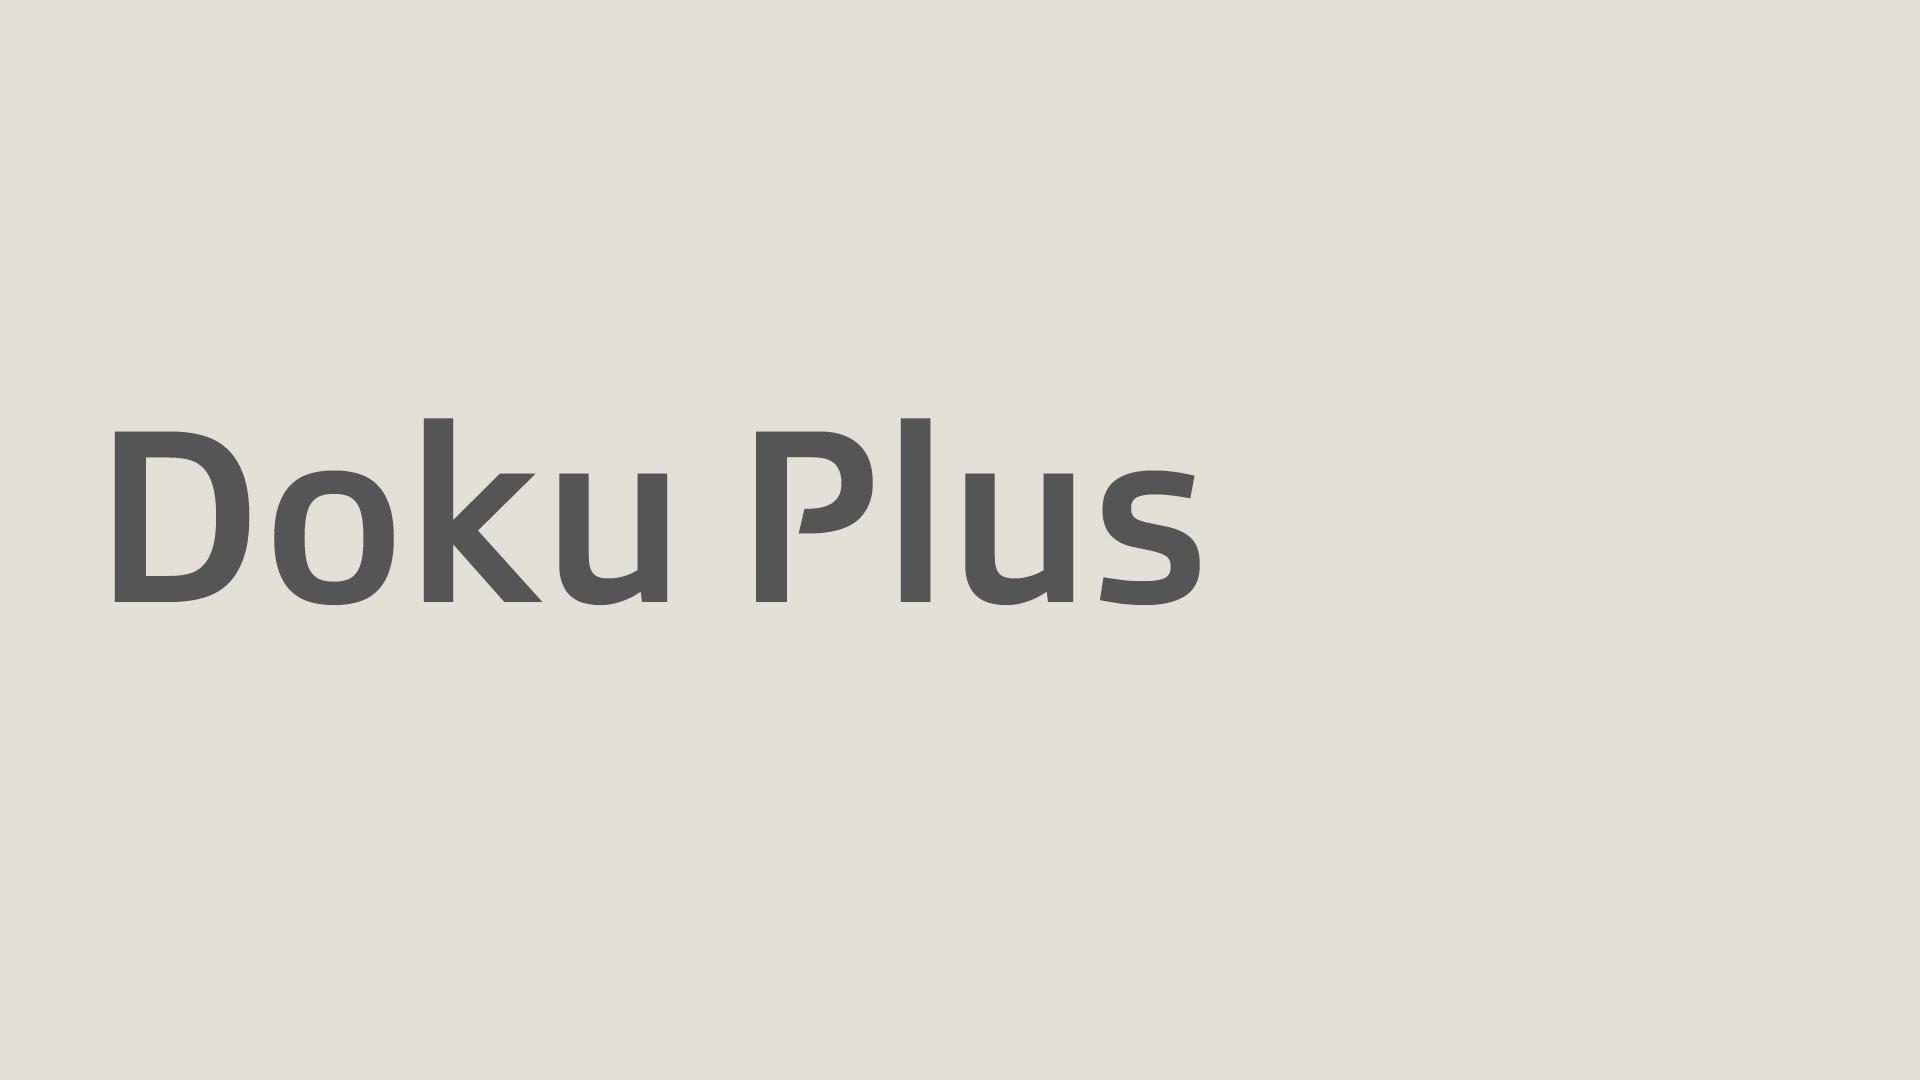 Doku Plus